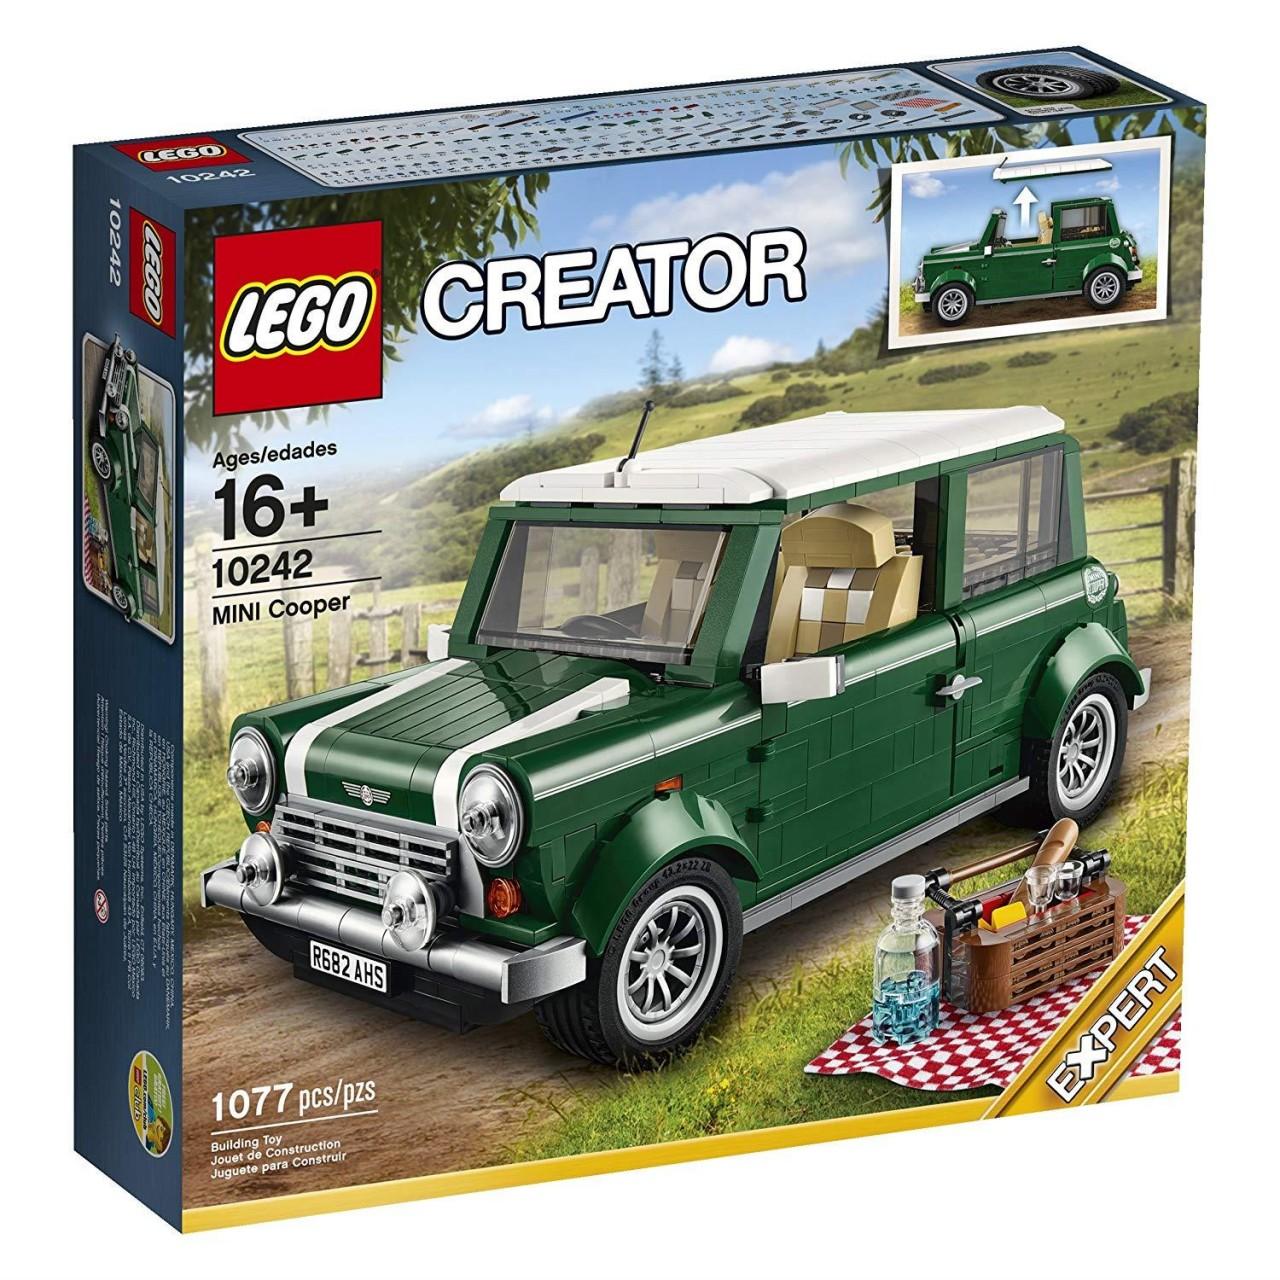 Lego Creator 10242 - MINI Cooper